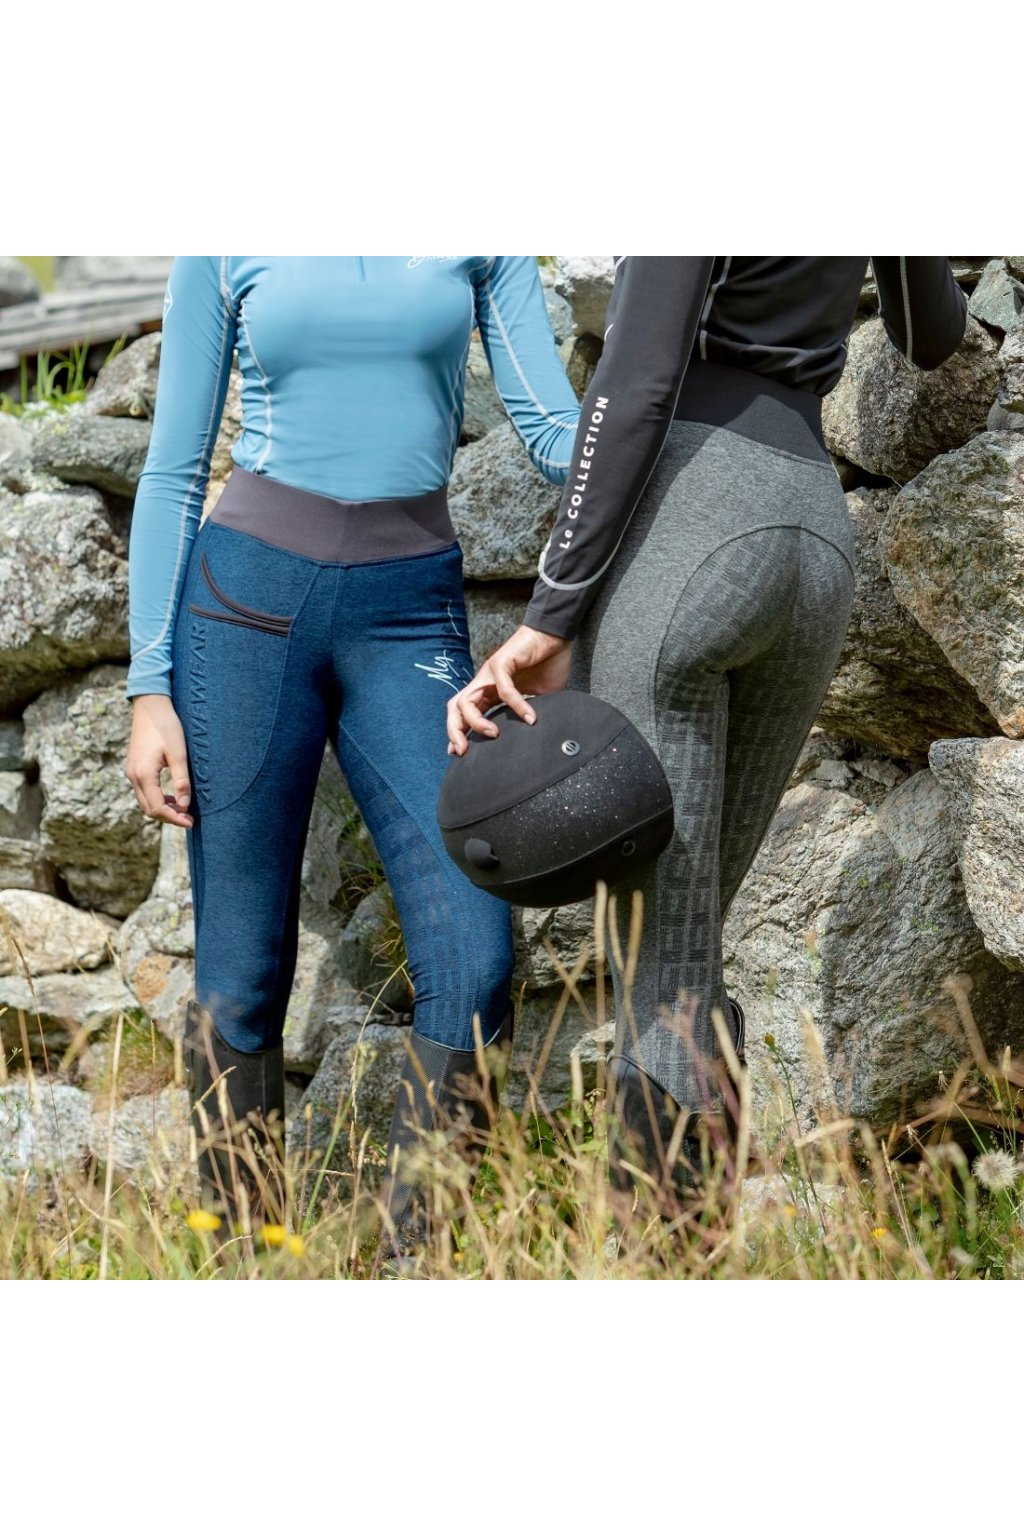 my lemieux ladies activewear pull on breeches grey3